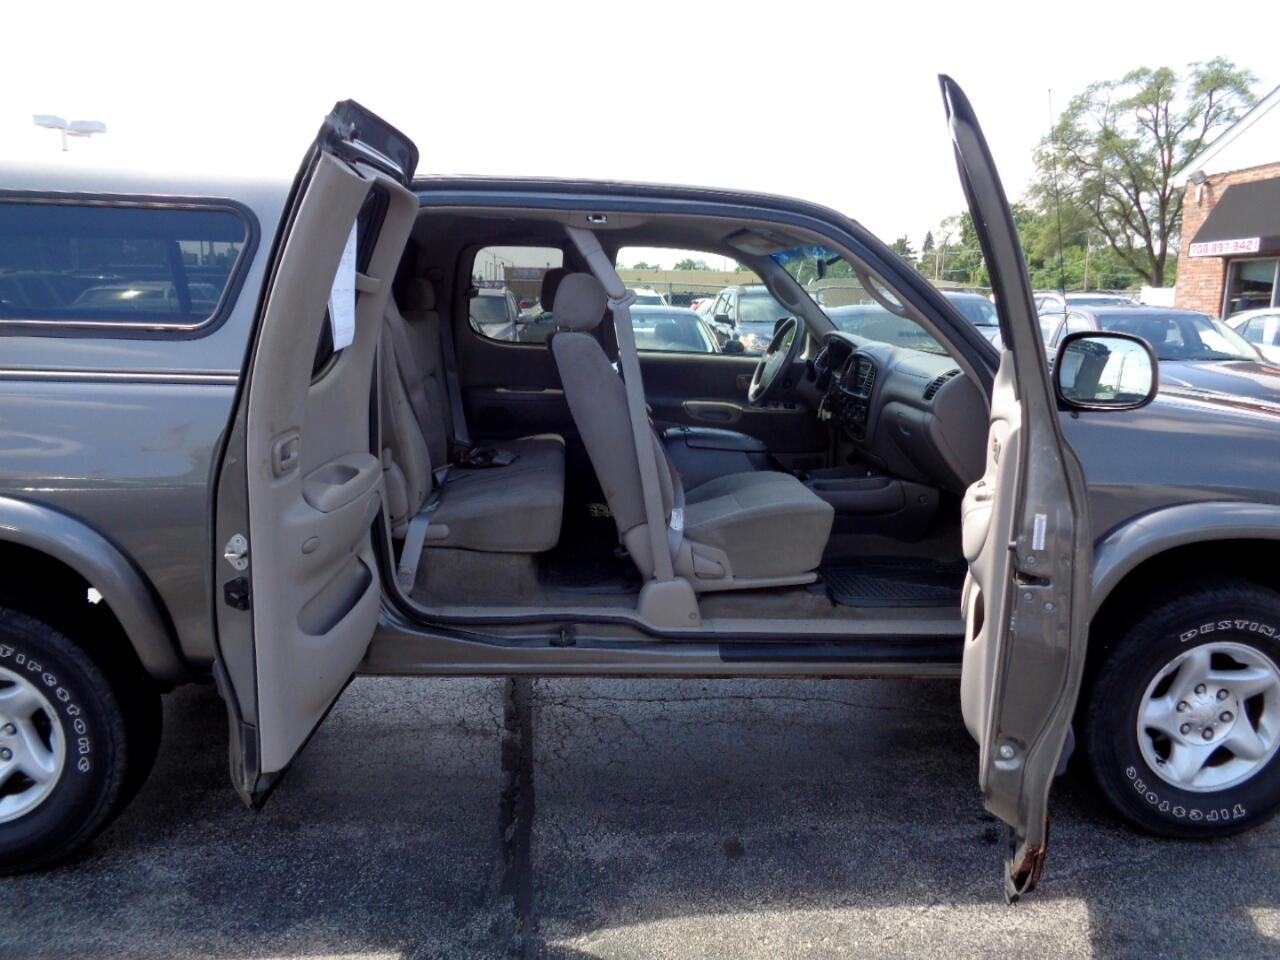 2003 Toyota Tundra SR5 Access Cab 4WD